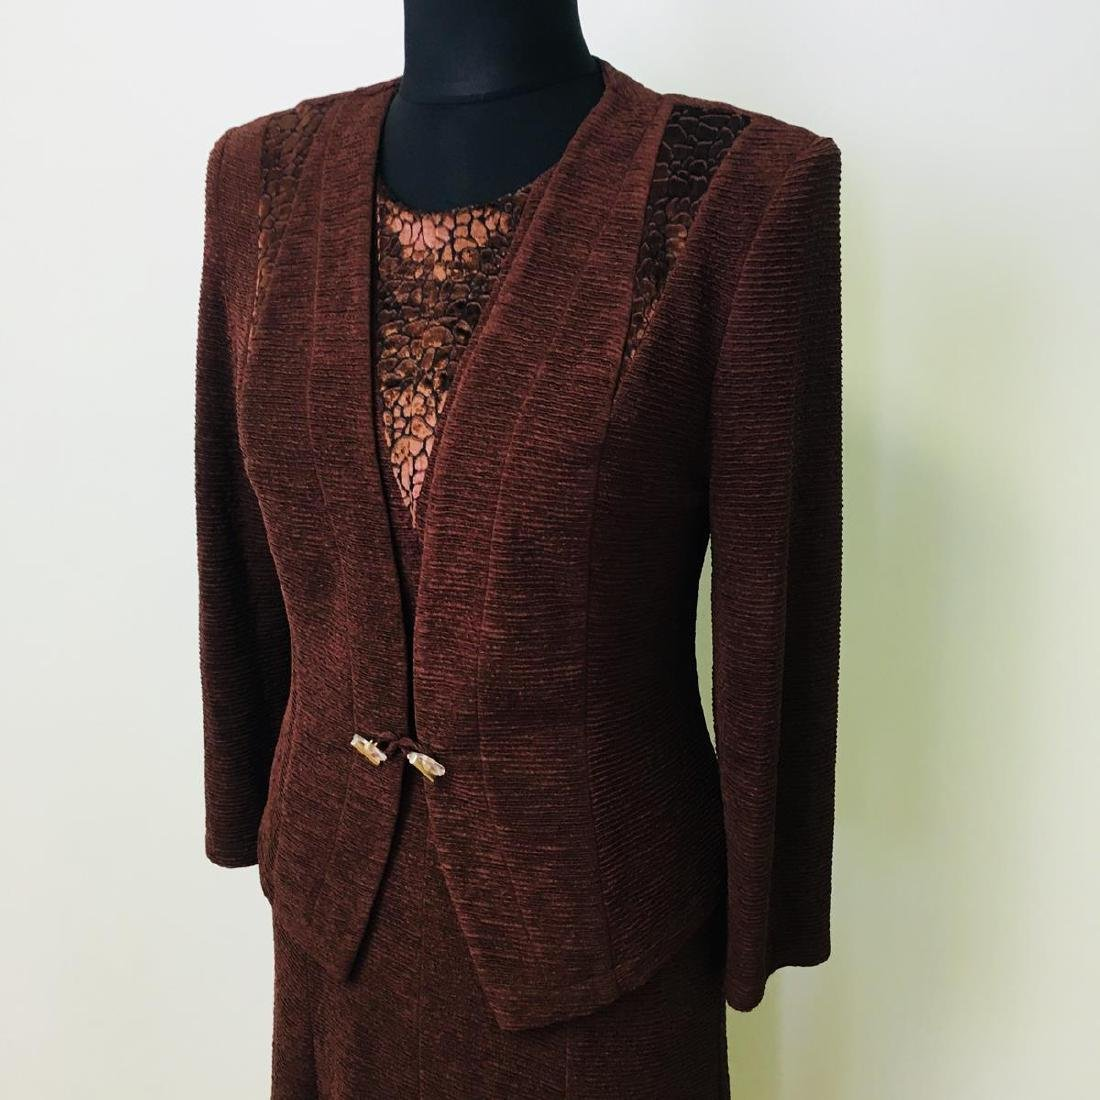 Vintage Women's 2 Piece Evening Jacket Dress Size M - 2